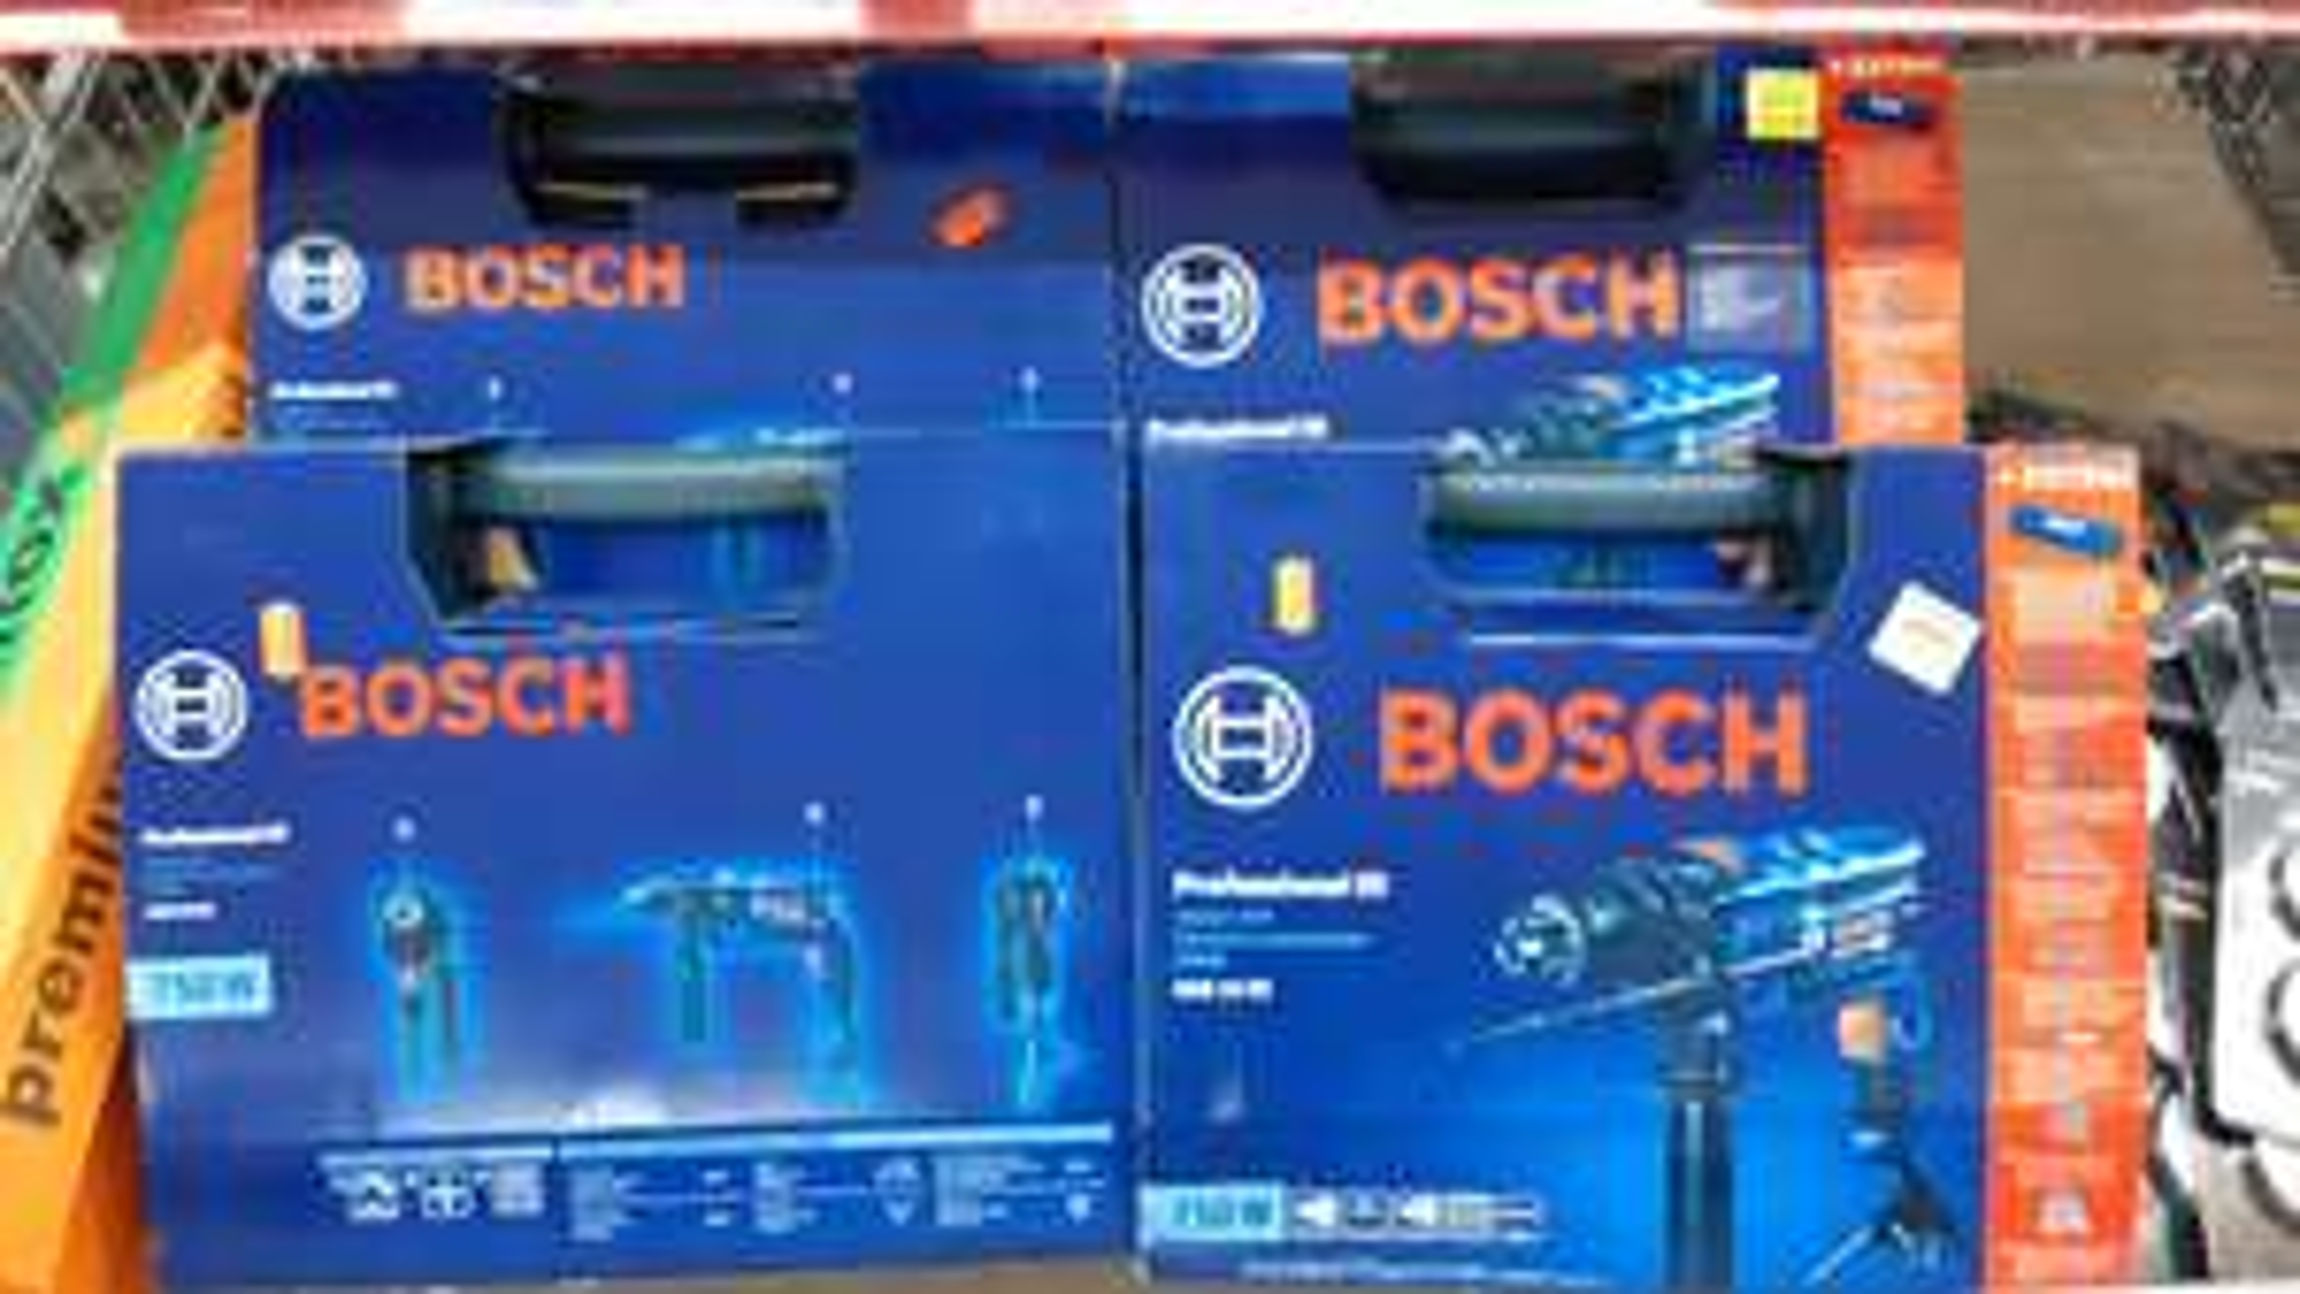 [Lokal] Bosch Professional GSB 16 RE Schlagbohrmaschine (PLZ 89281)